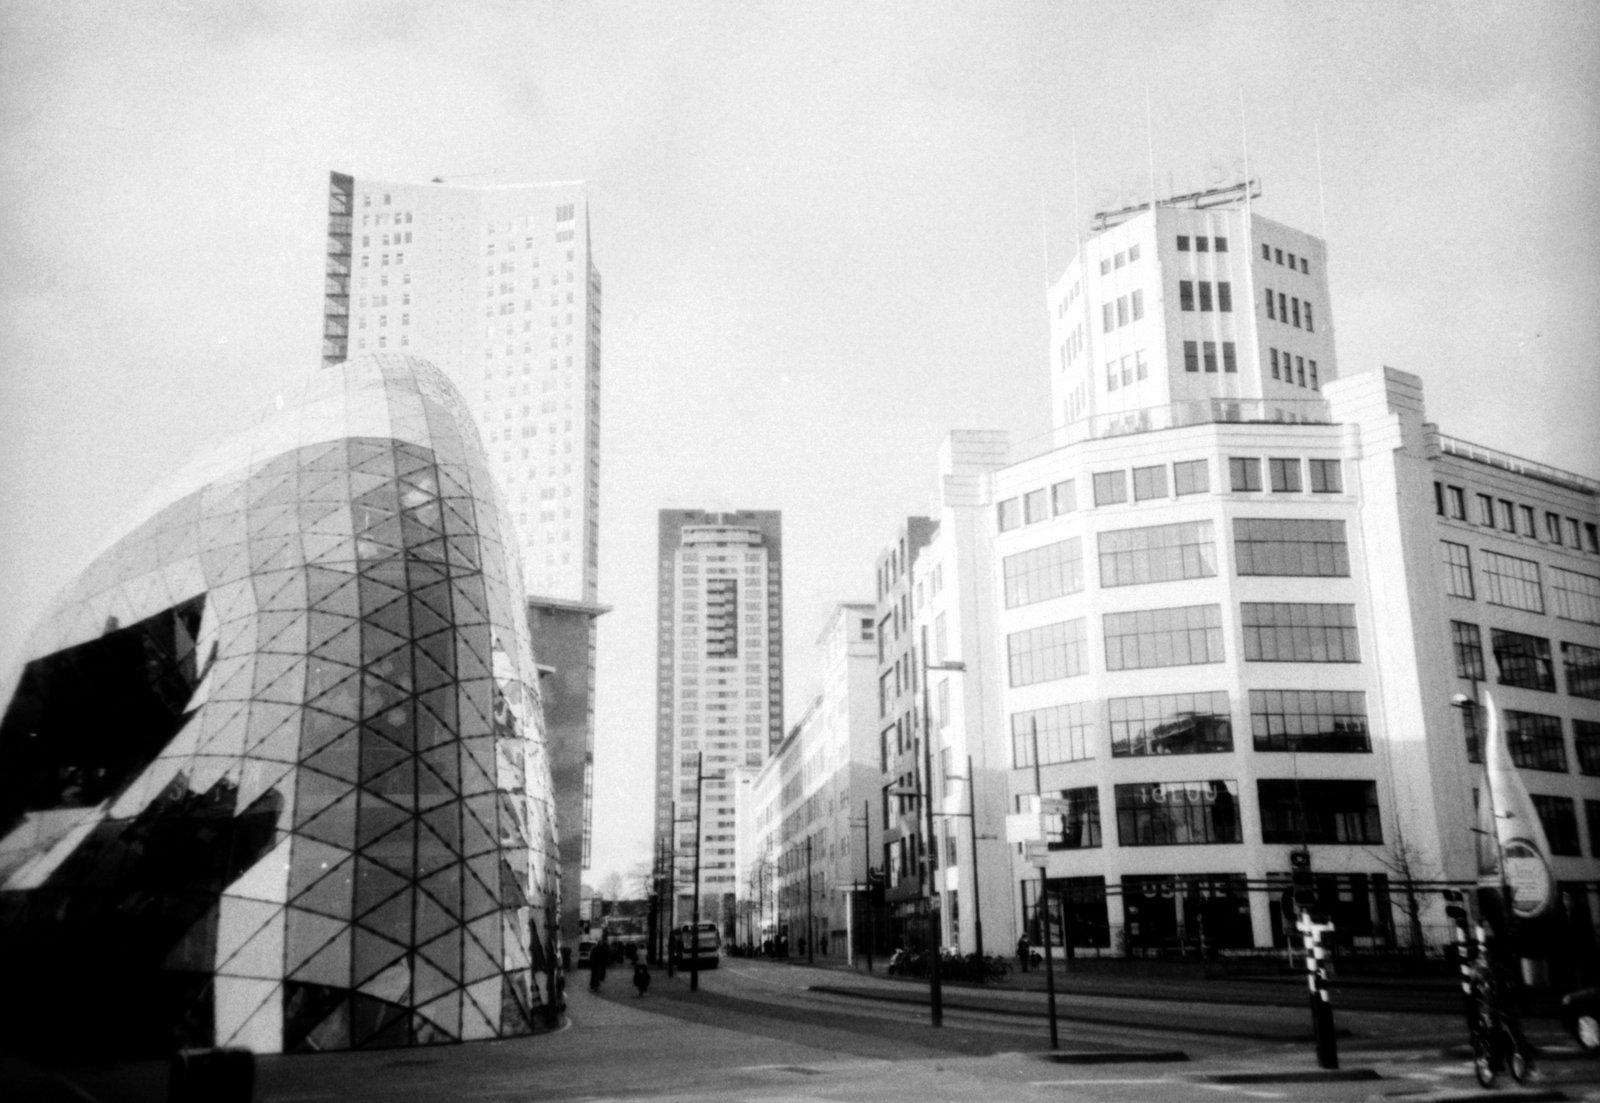 Blob Regent Admirant Eindhoven - Analoge fotografie